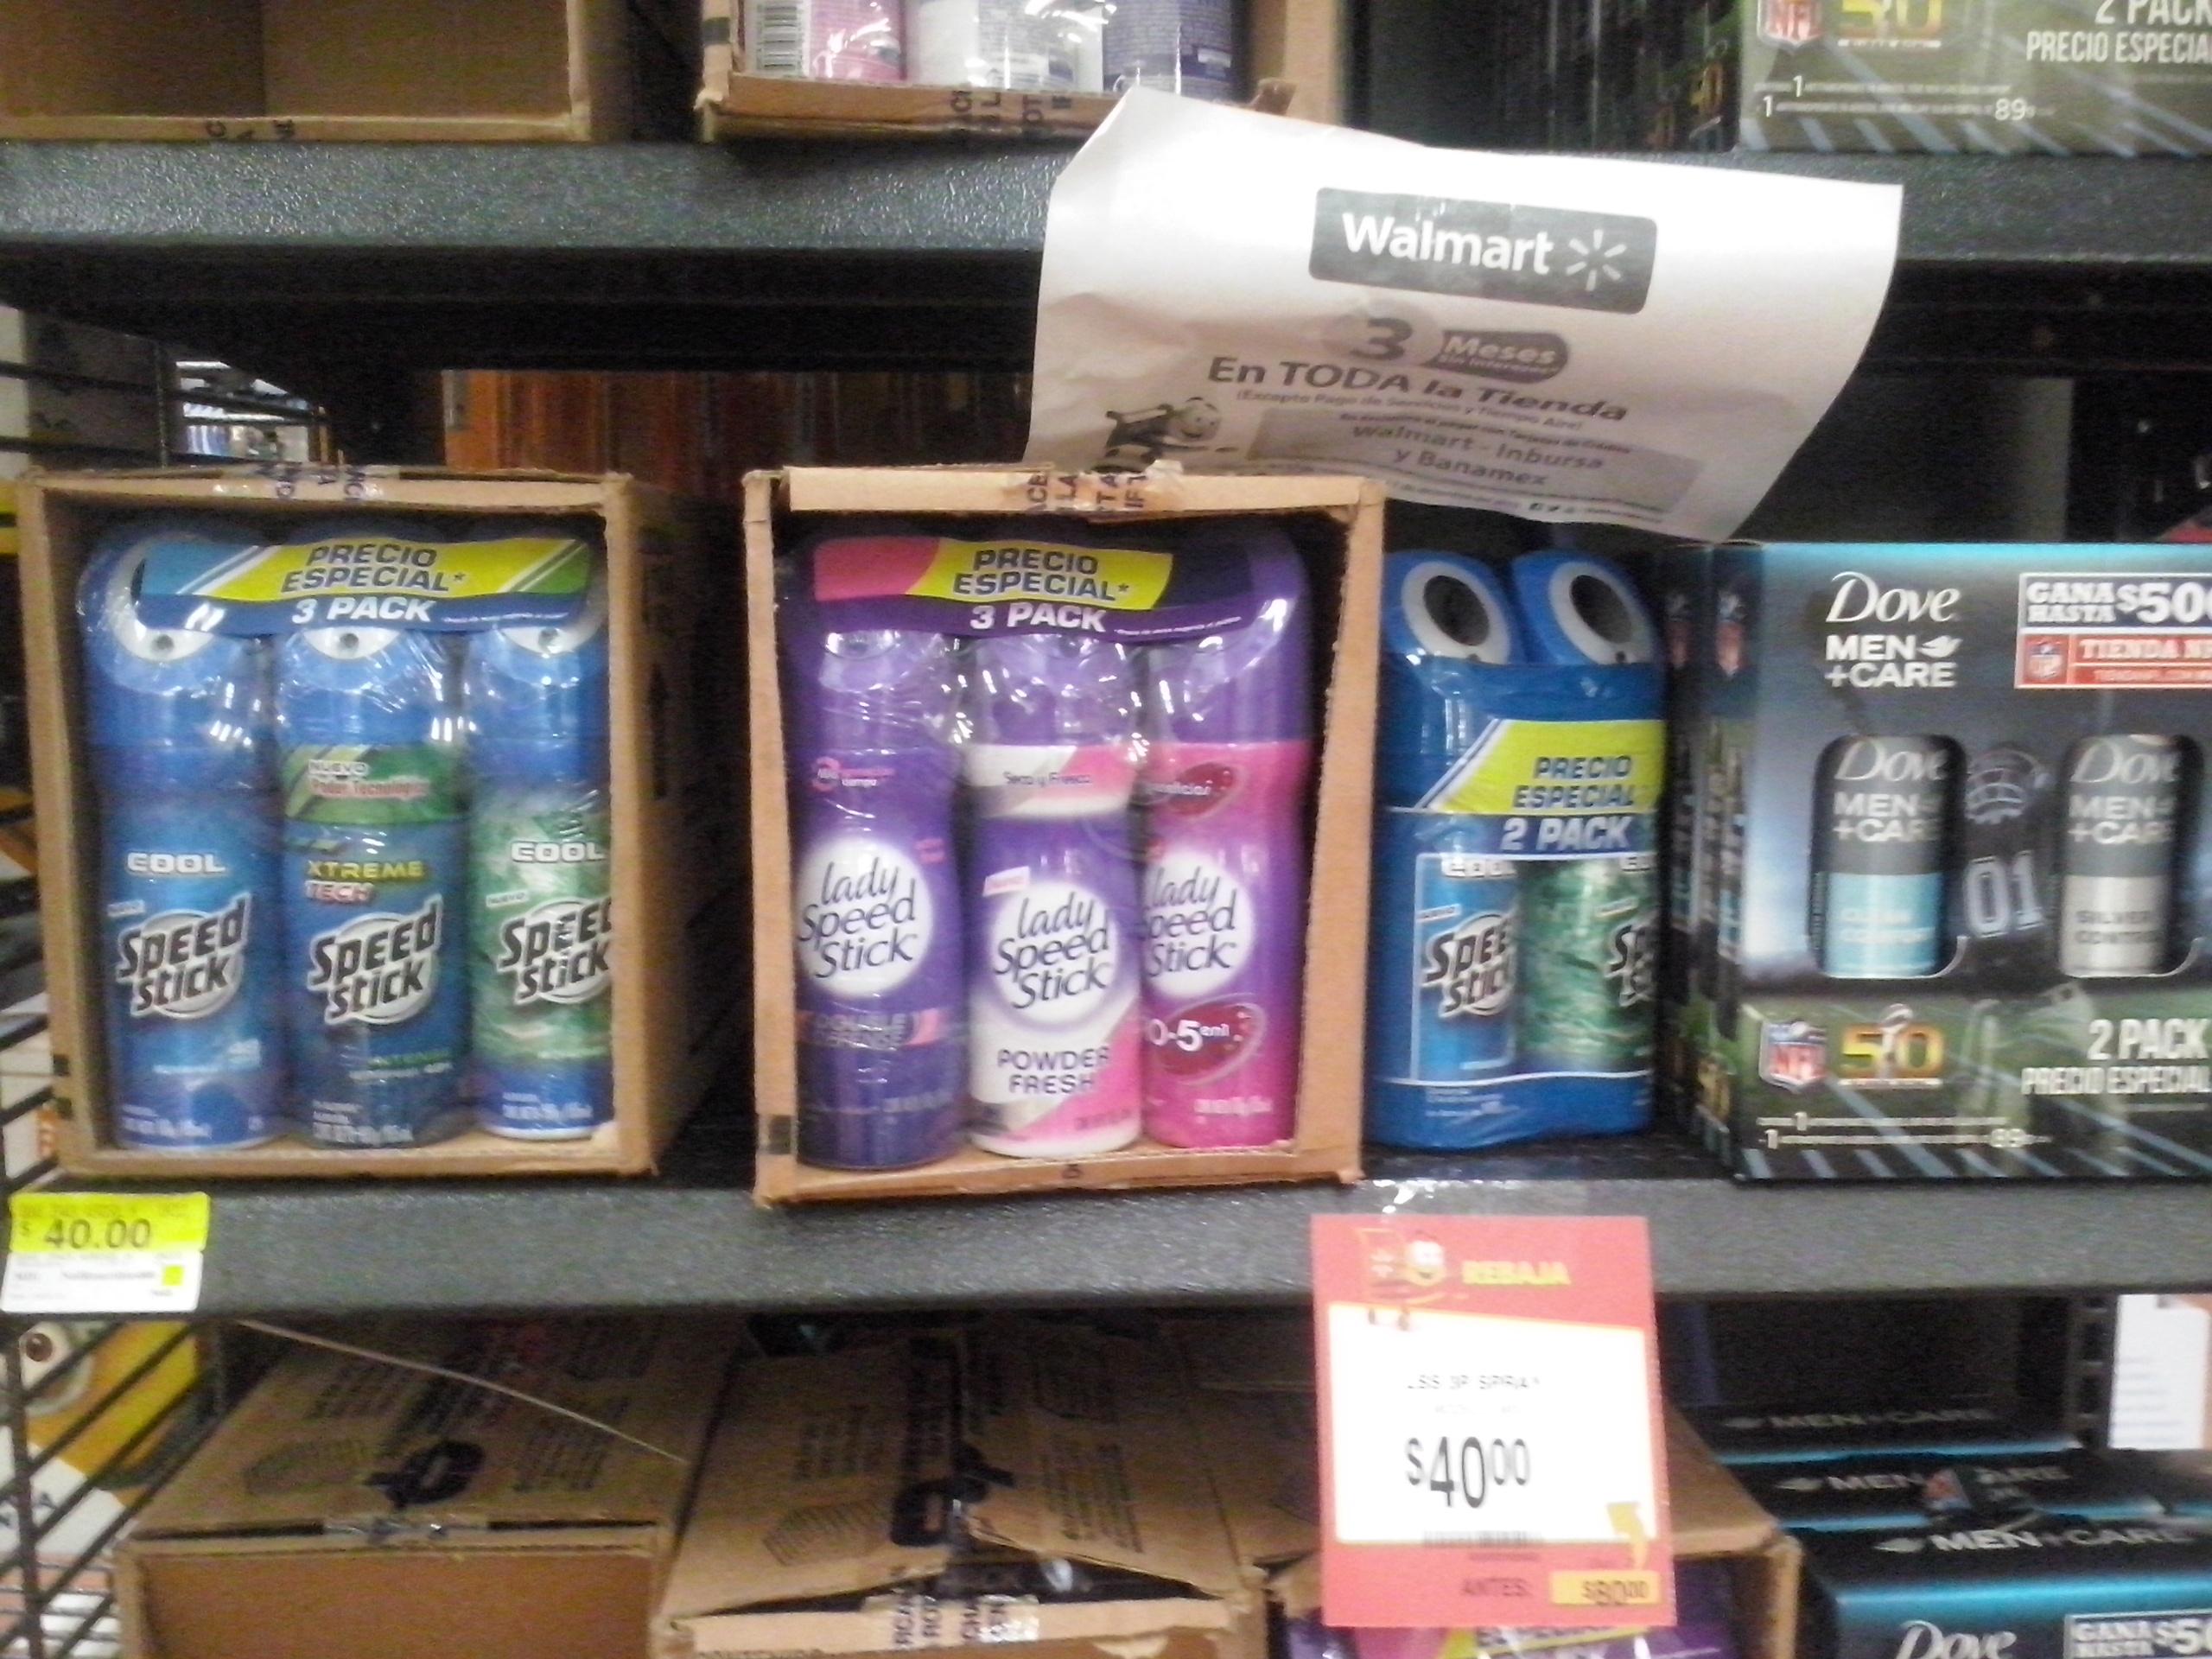 Walmart Universidad tripack desodorantes speed stick a $$40